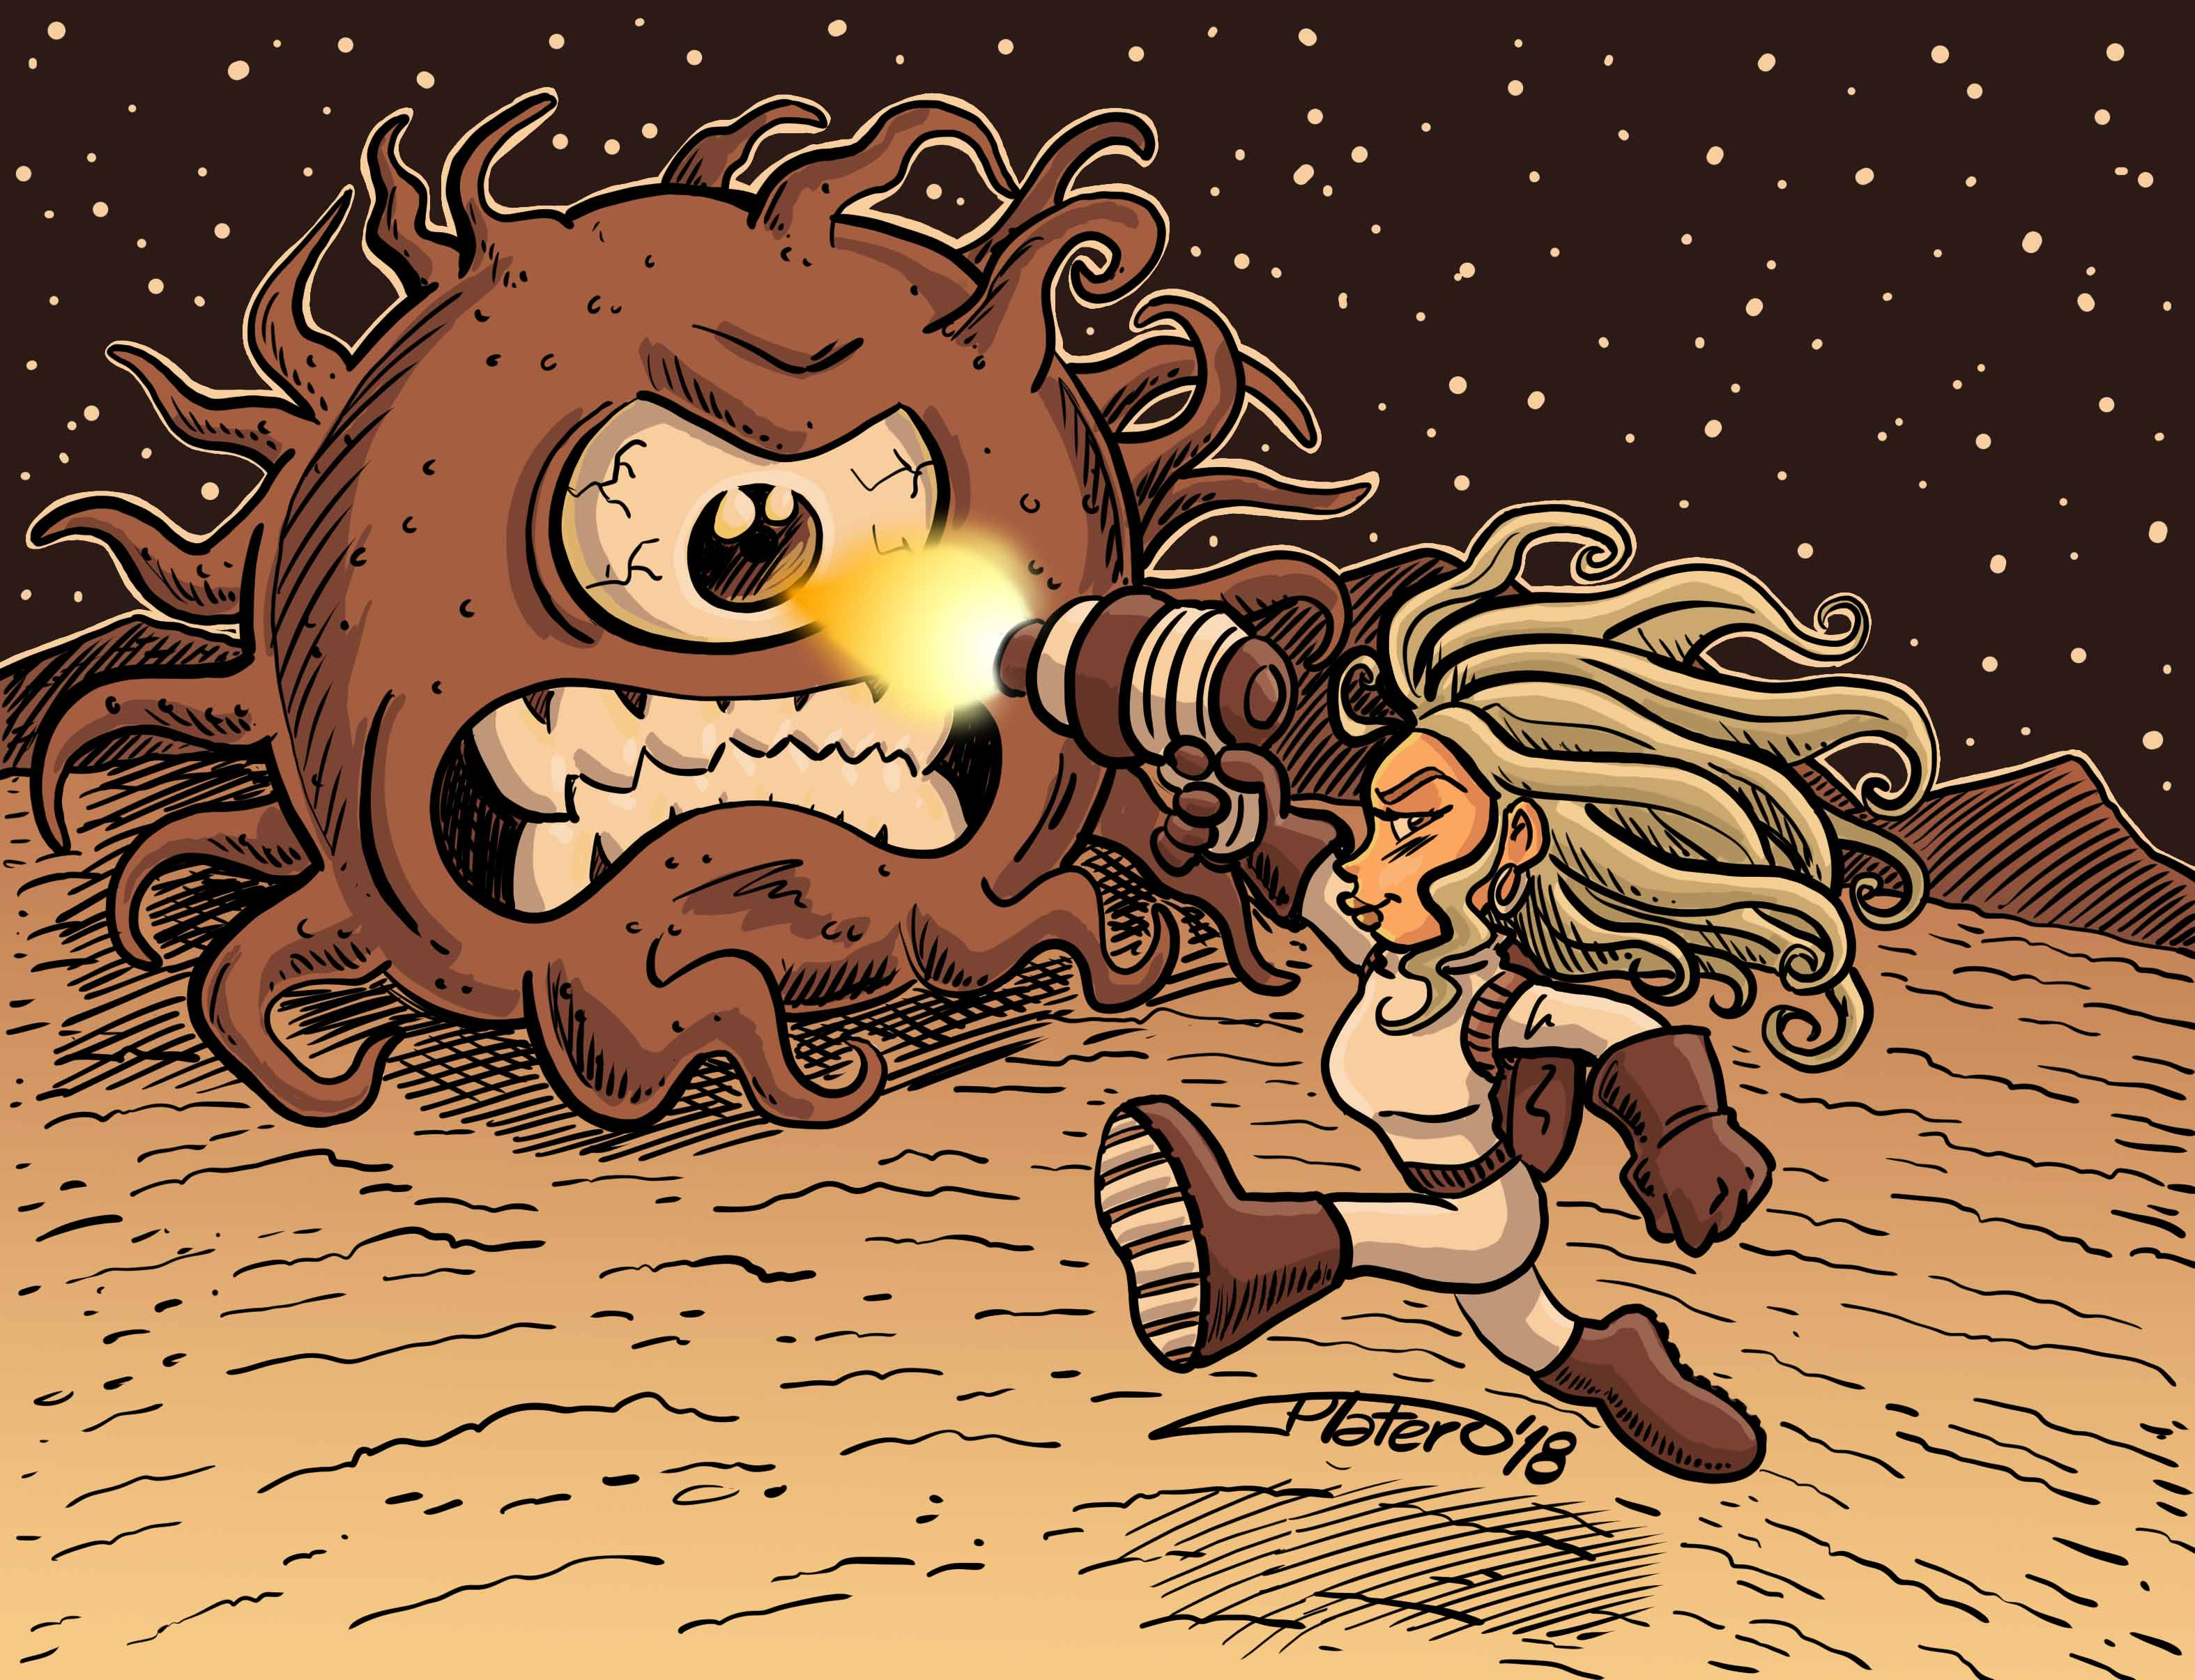 COLOR_batalla_espacial_extraterrestre_chica_astronauta_jose_luis_platero_dibujo